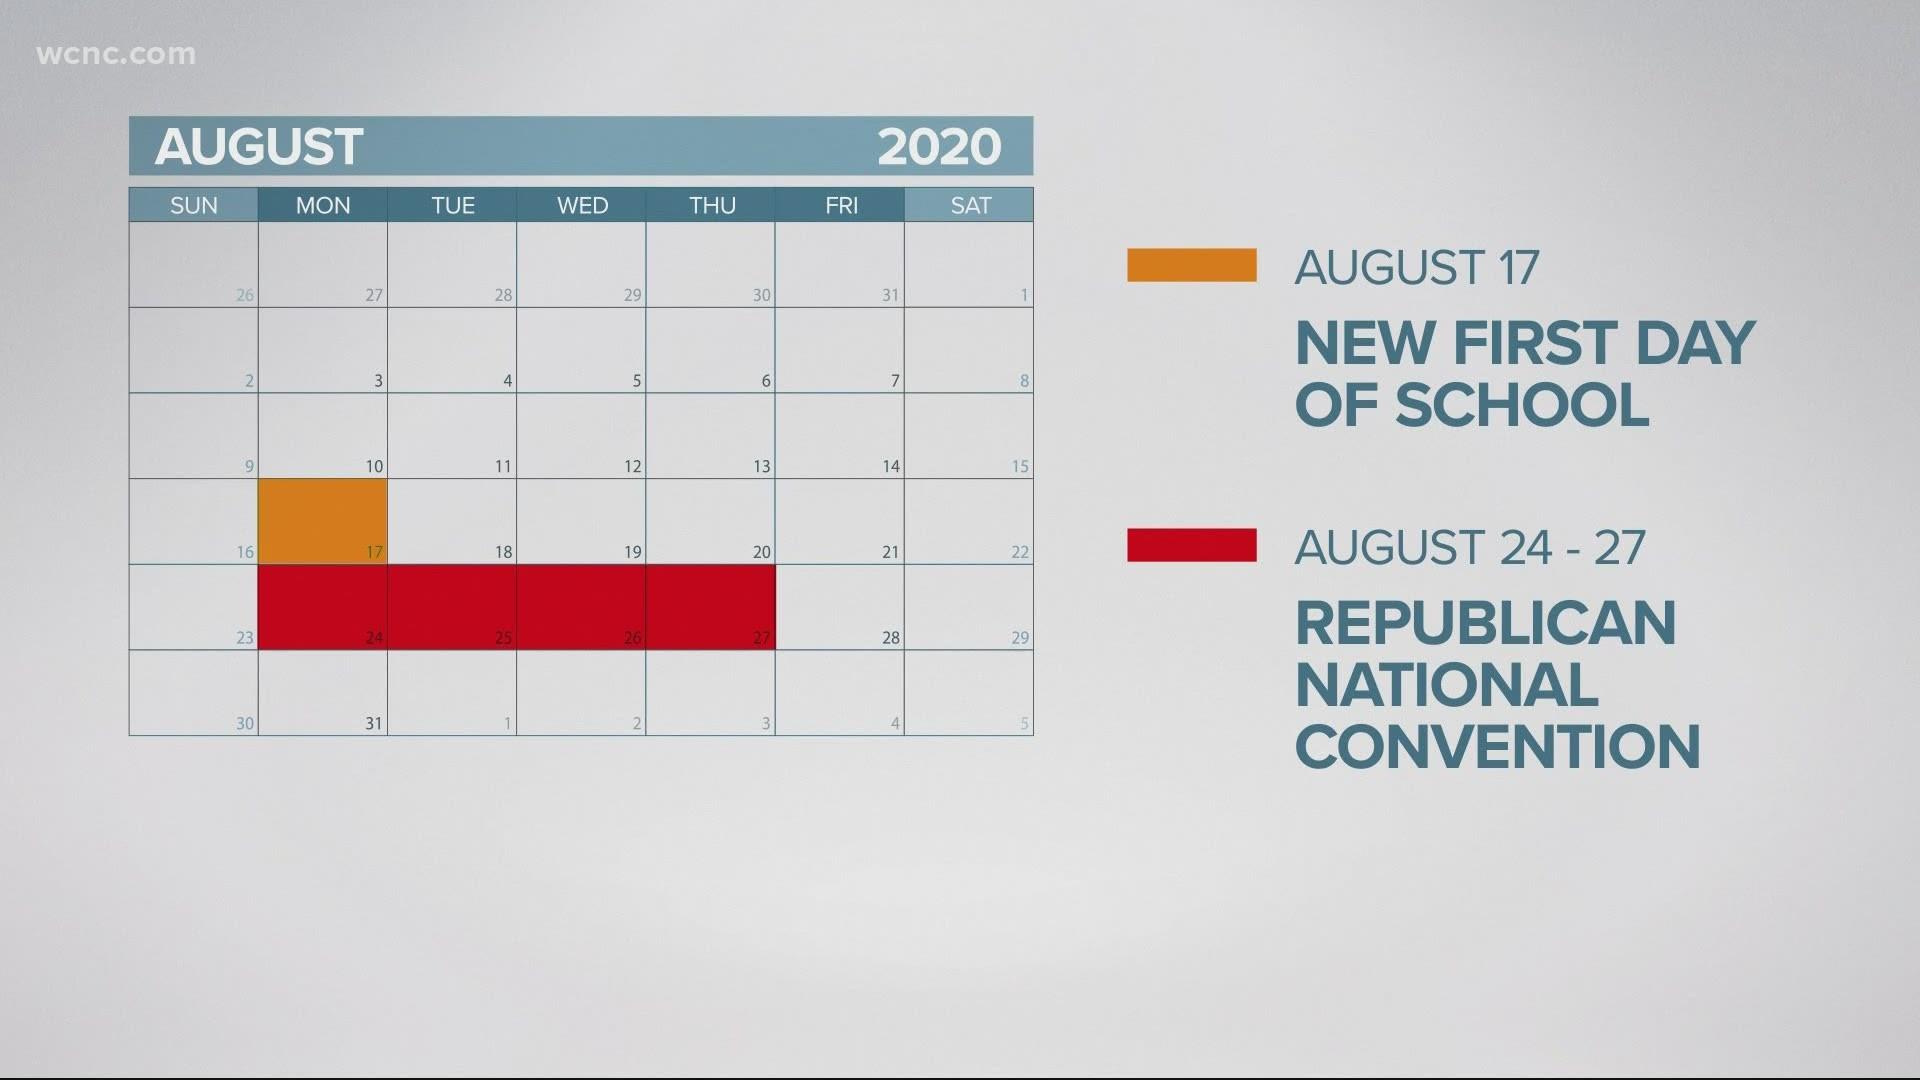 Cms 2021 And 2019 Calendar CMS announces schedule changes for 2020 21 academic calendar